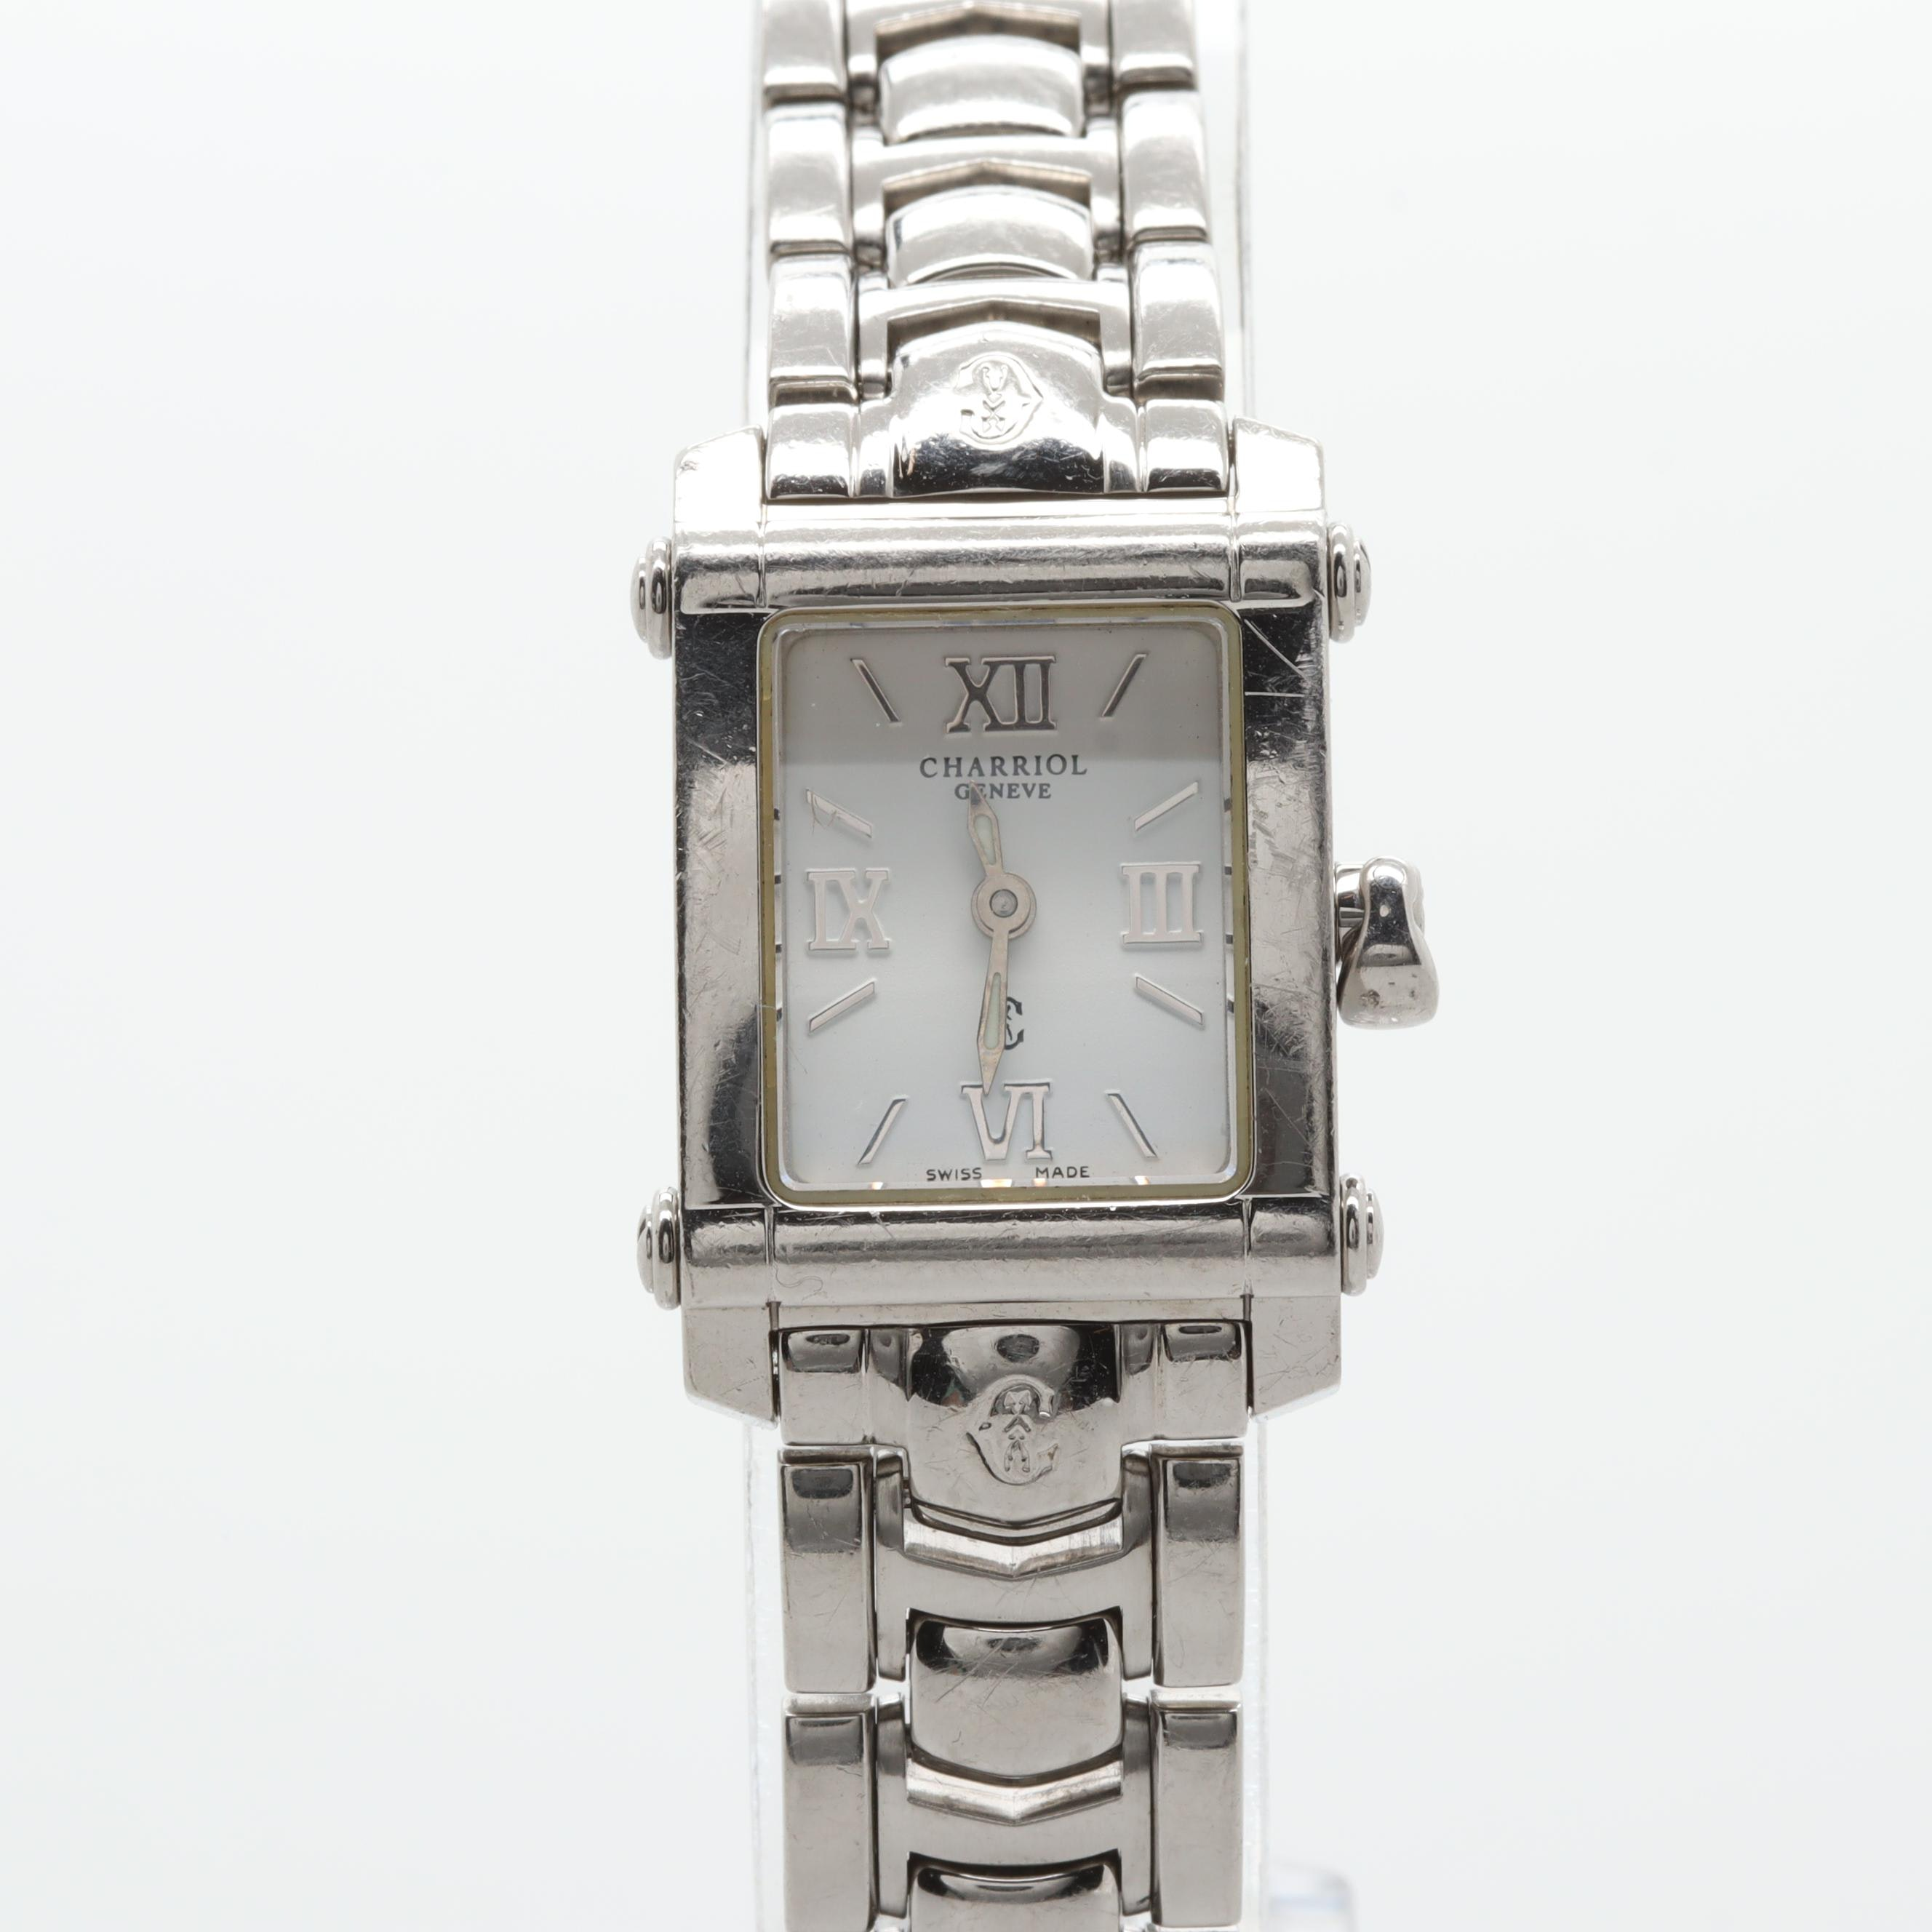 "Charriol ""Geneve"" Swiss Made Stainless Steel Wristwatch"